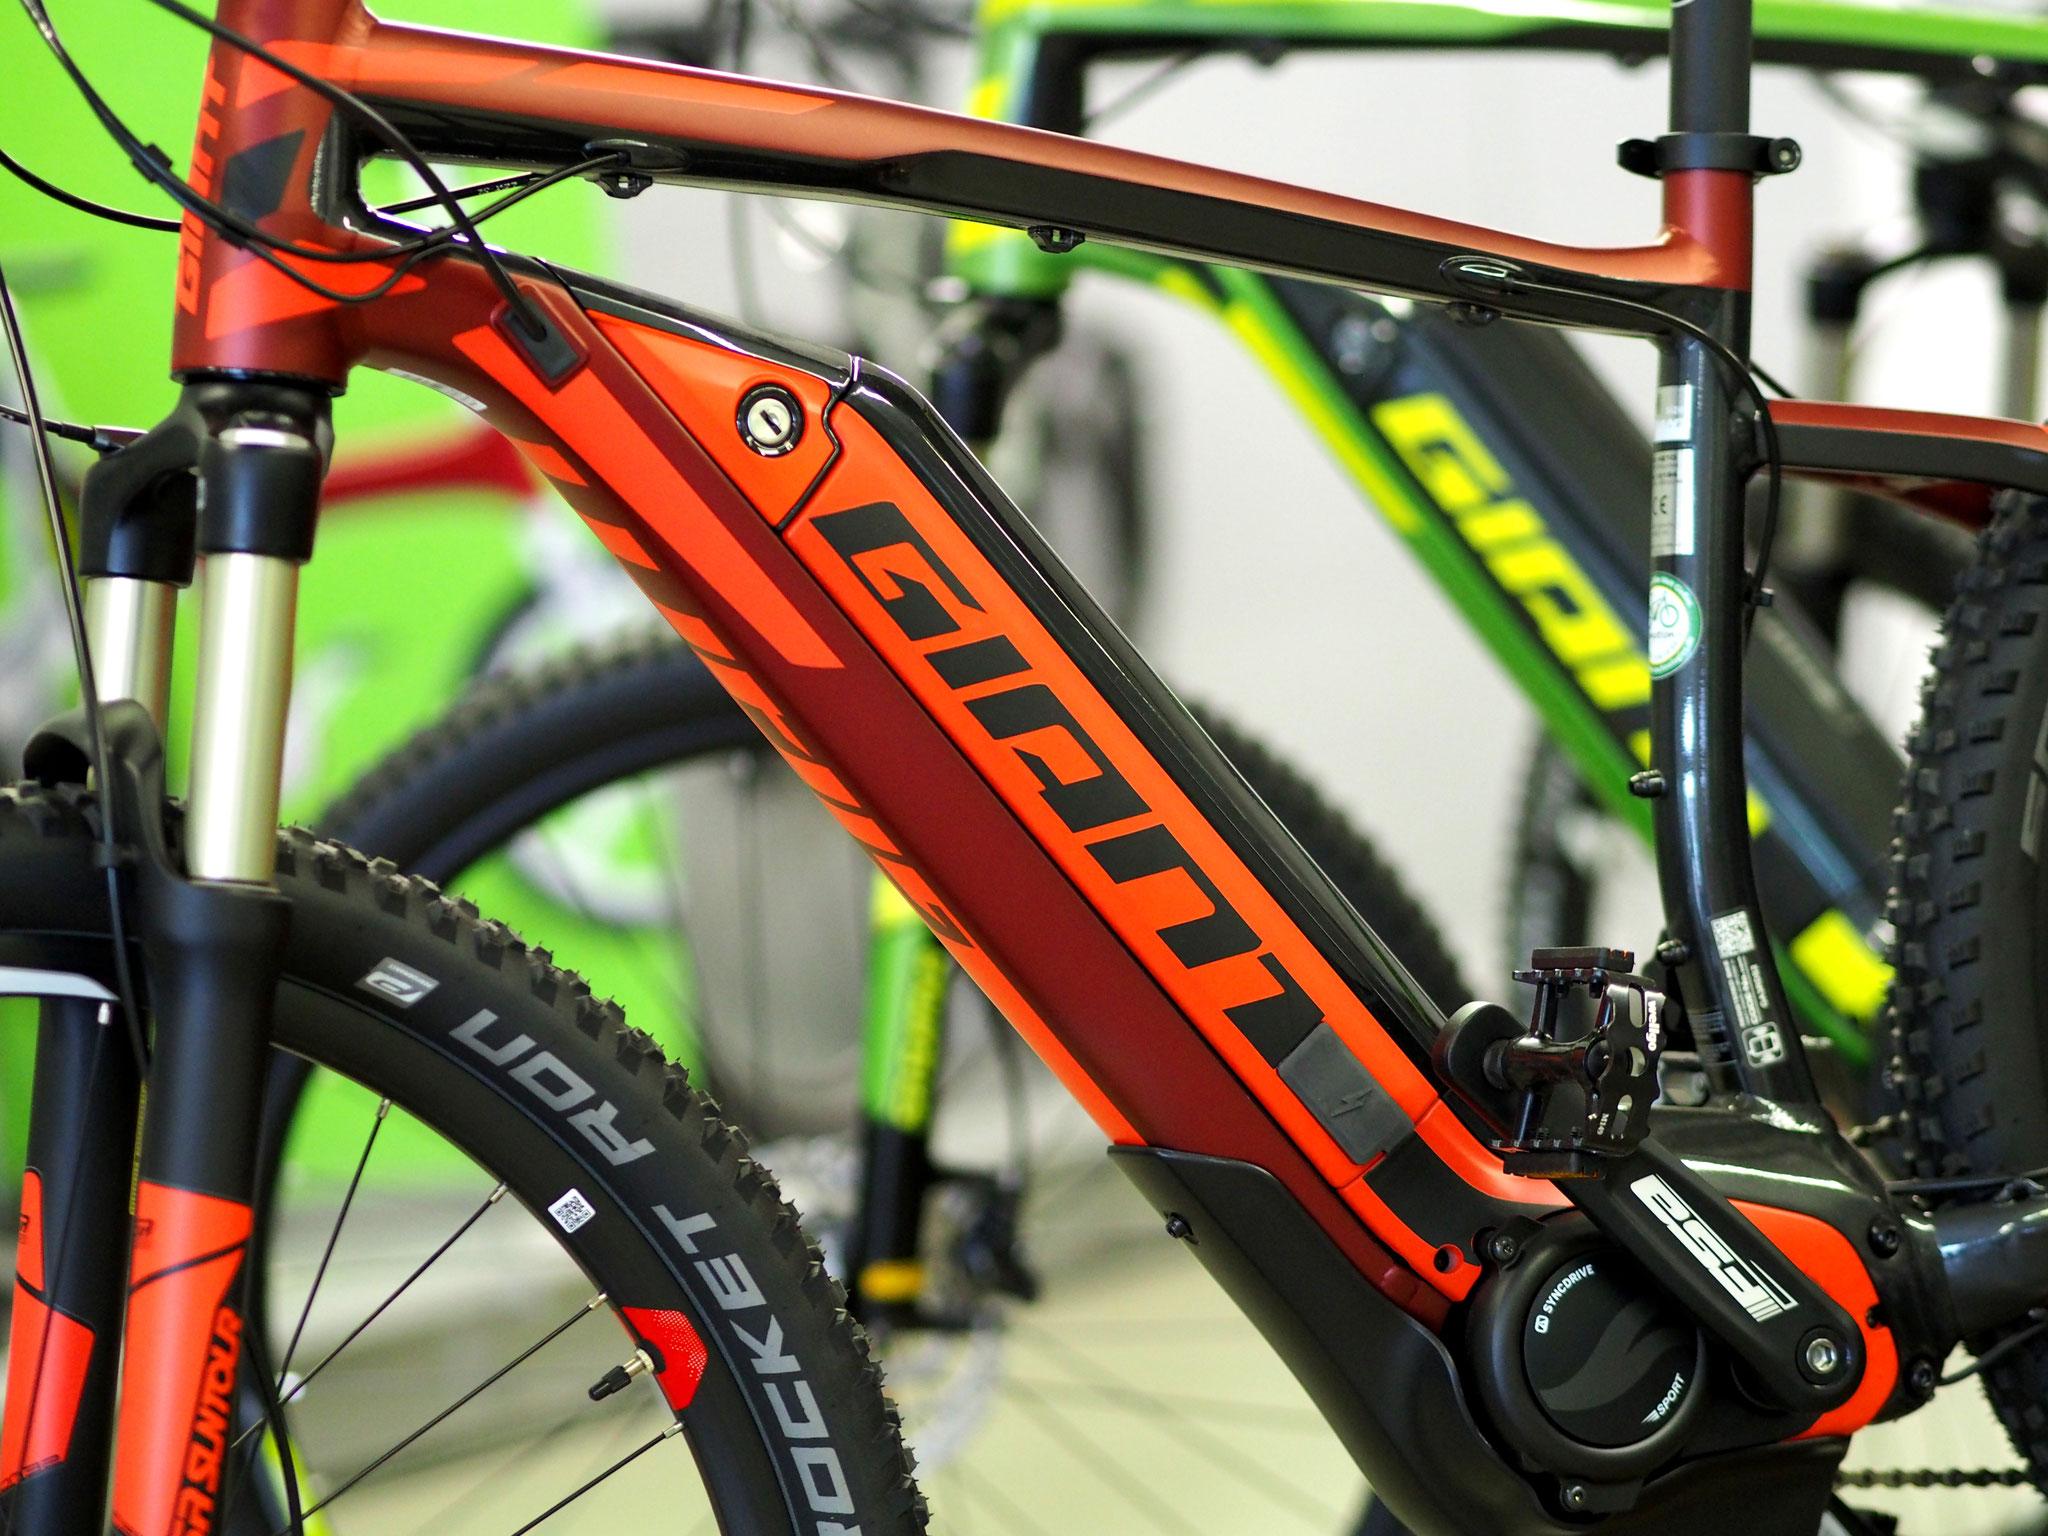 e-motion e-Bike Welt Gießen e-Bikes, Pedelecs und Elektrofahrräder von Giant